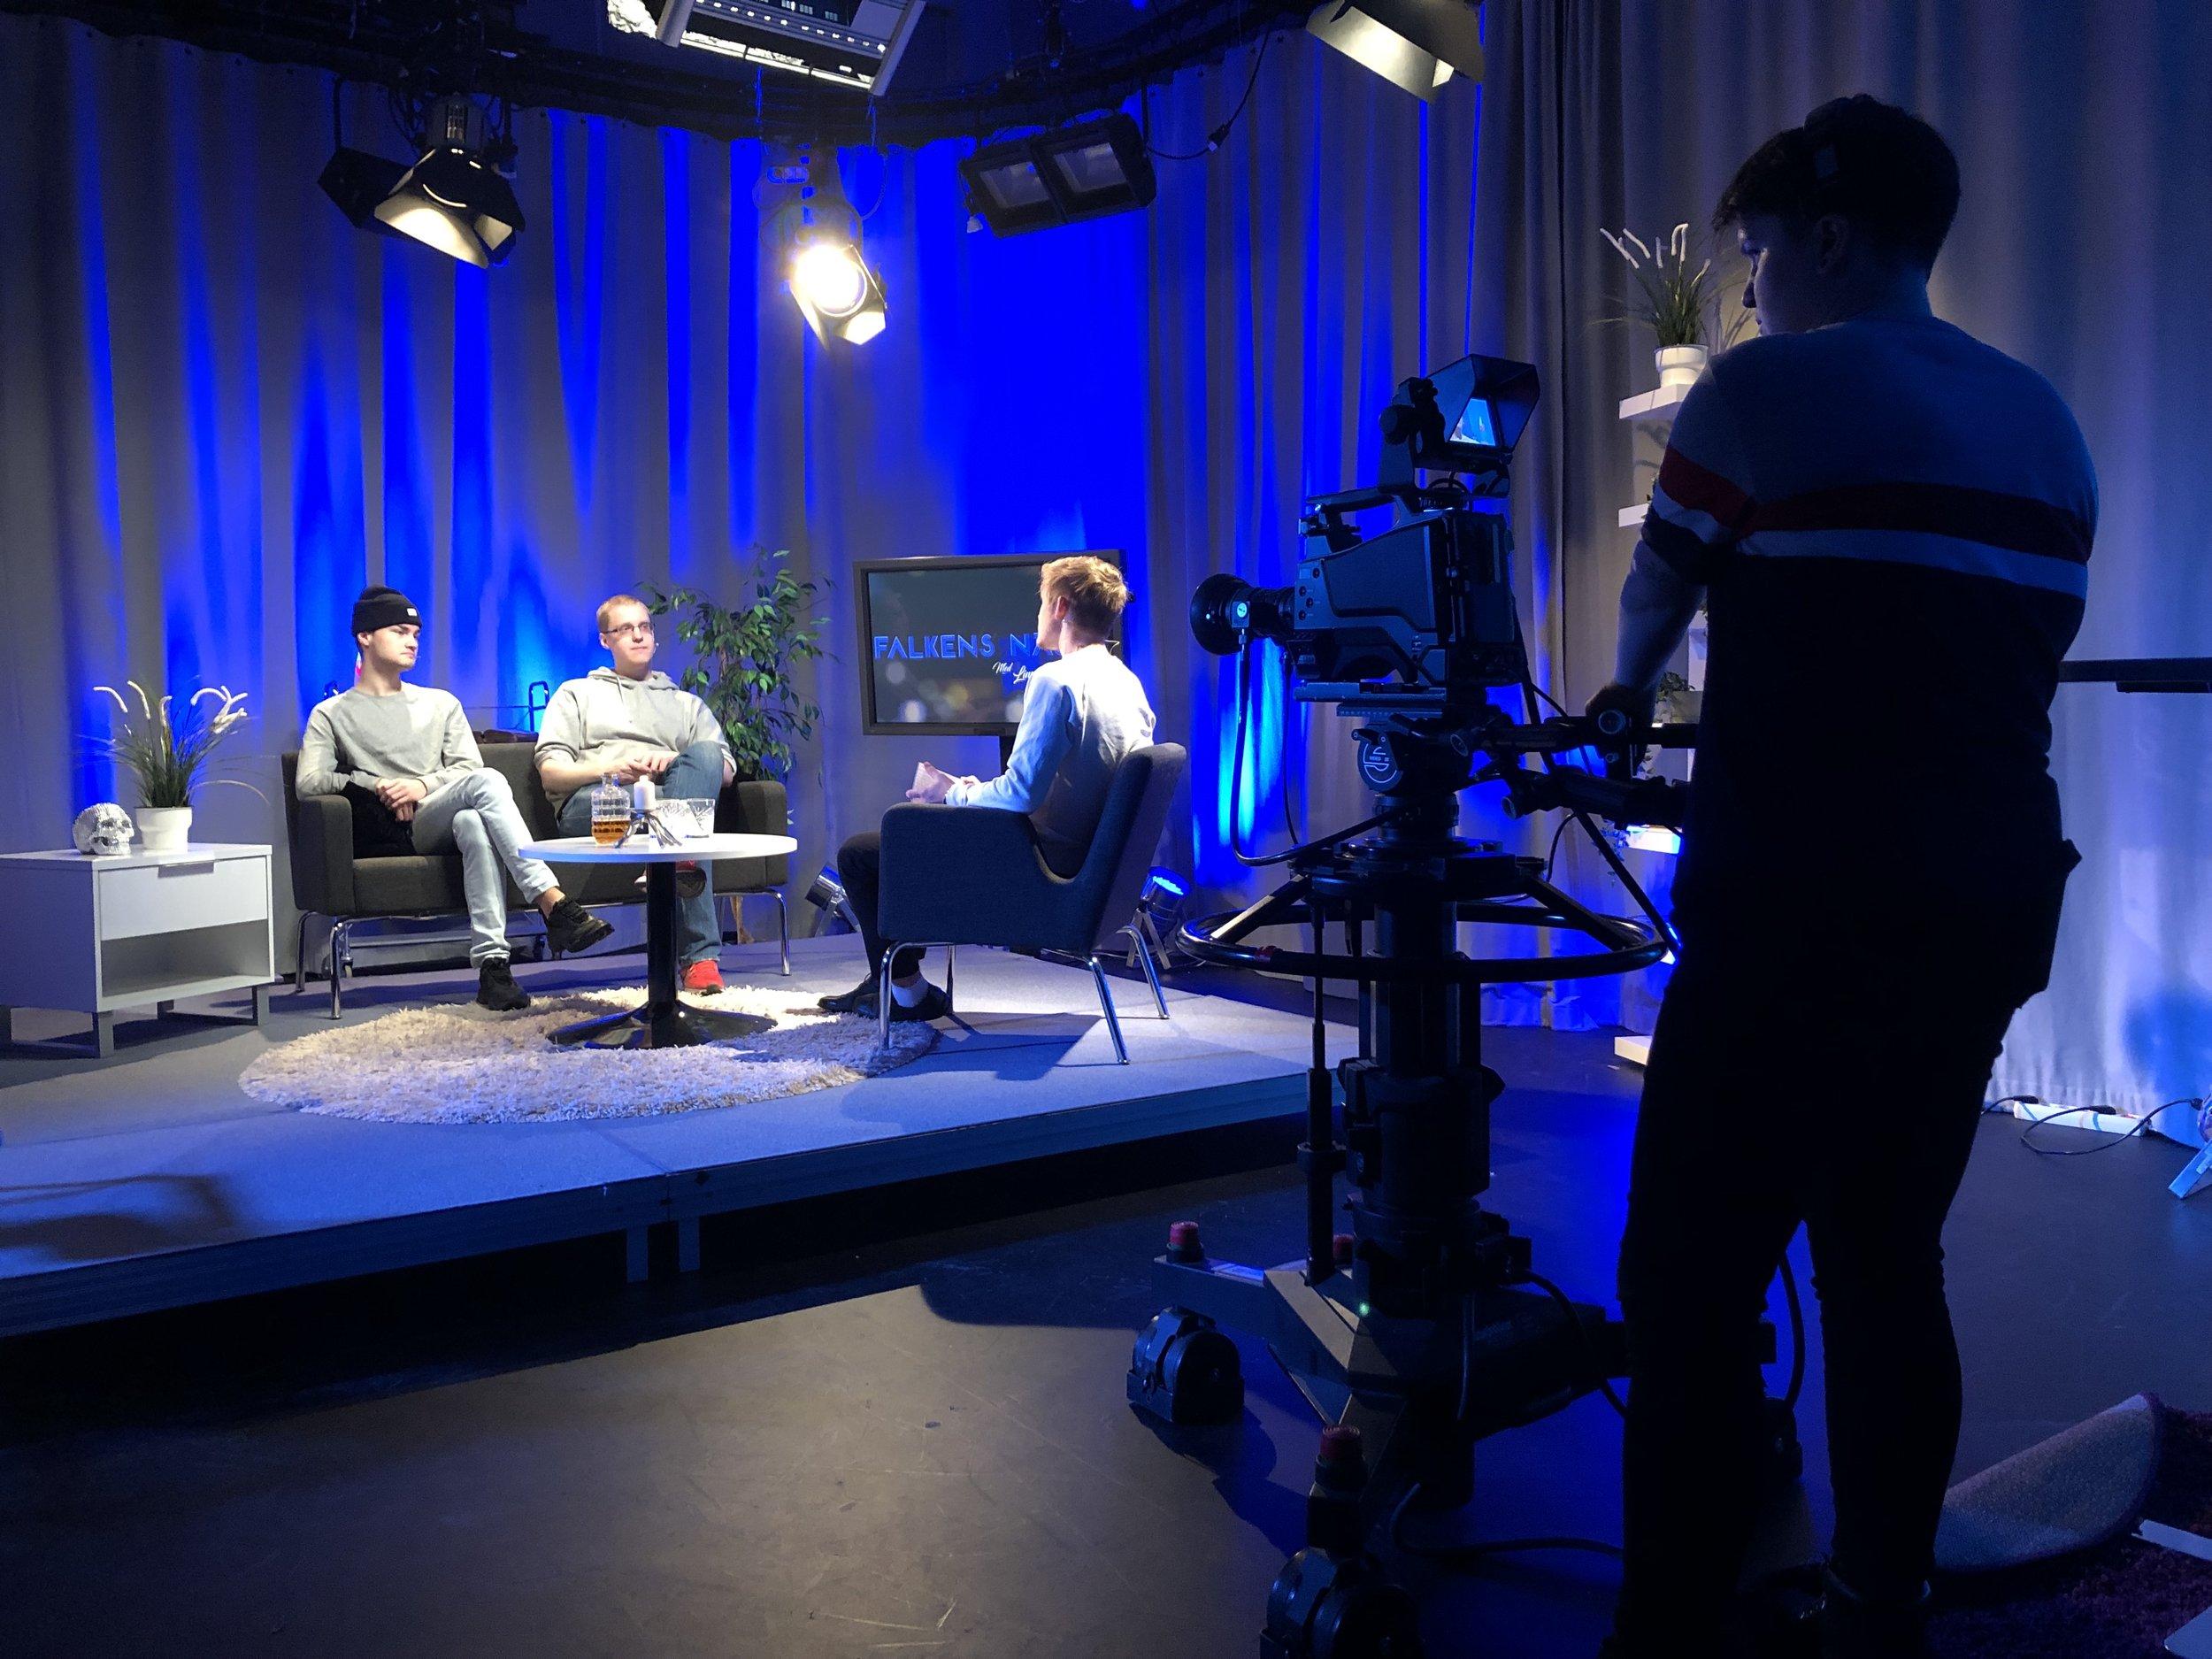 Tv-studioprojekt i A-studion på Xenter i Botkyrka.